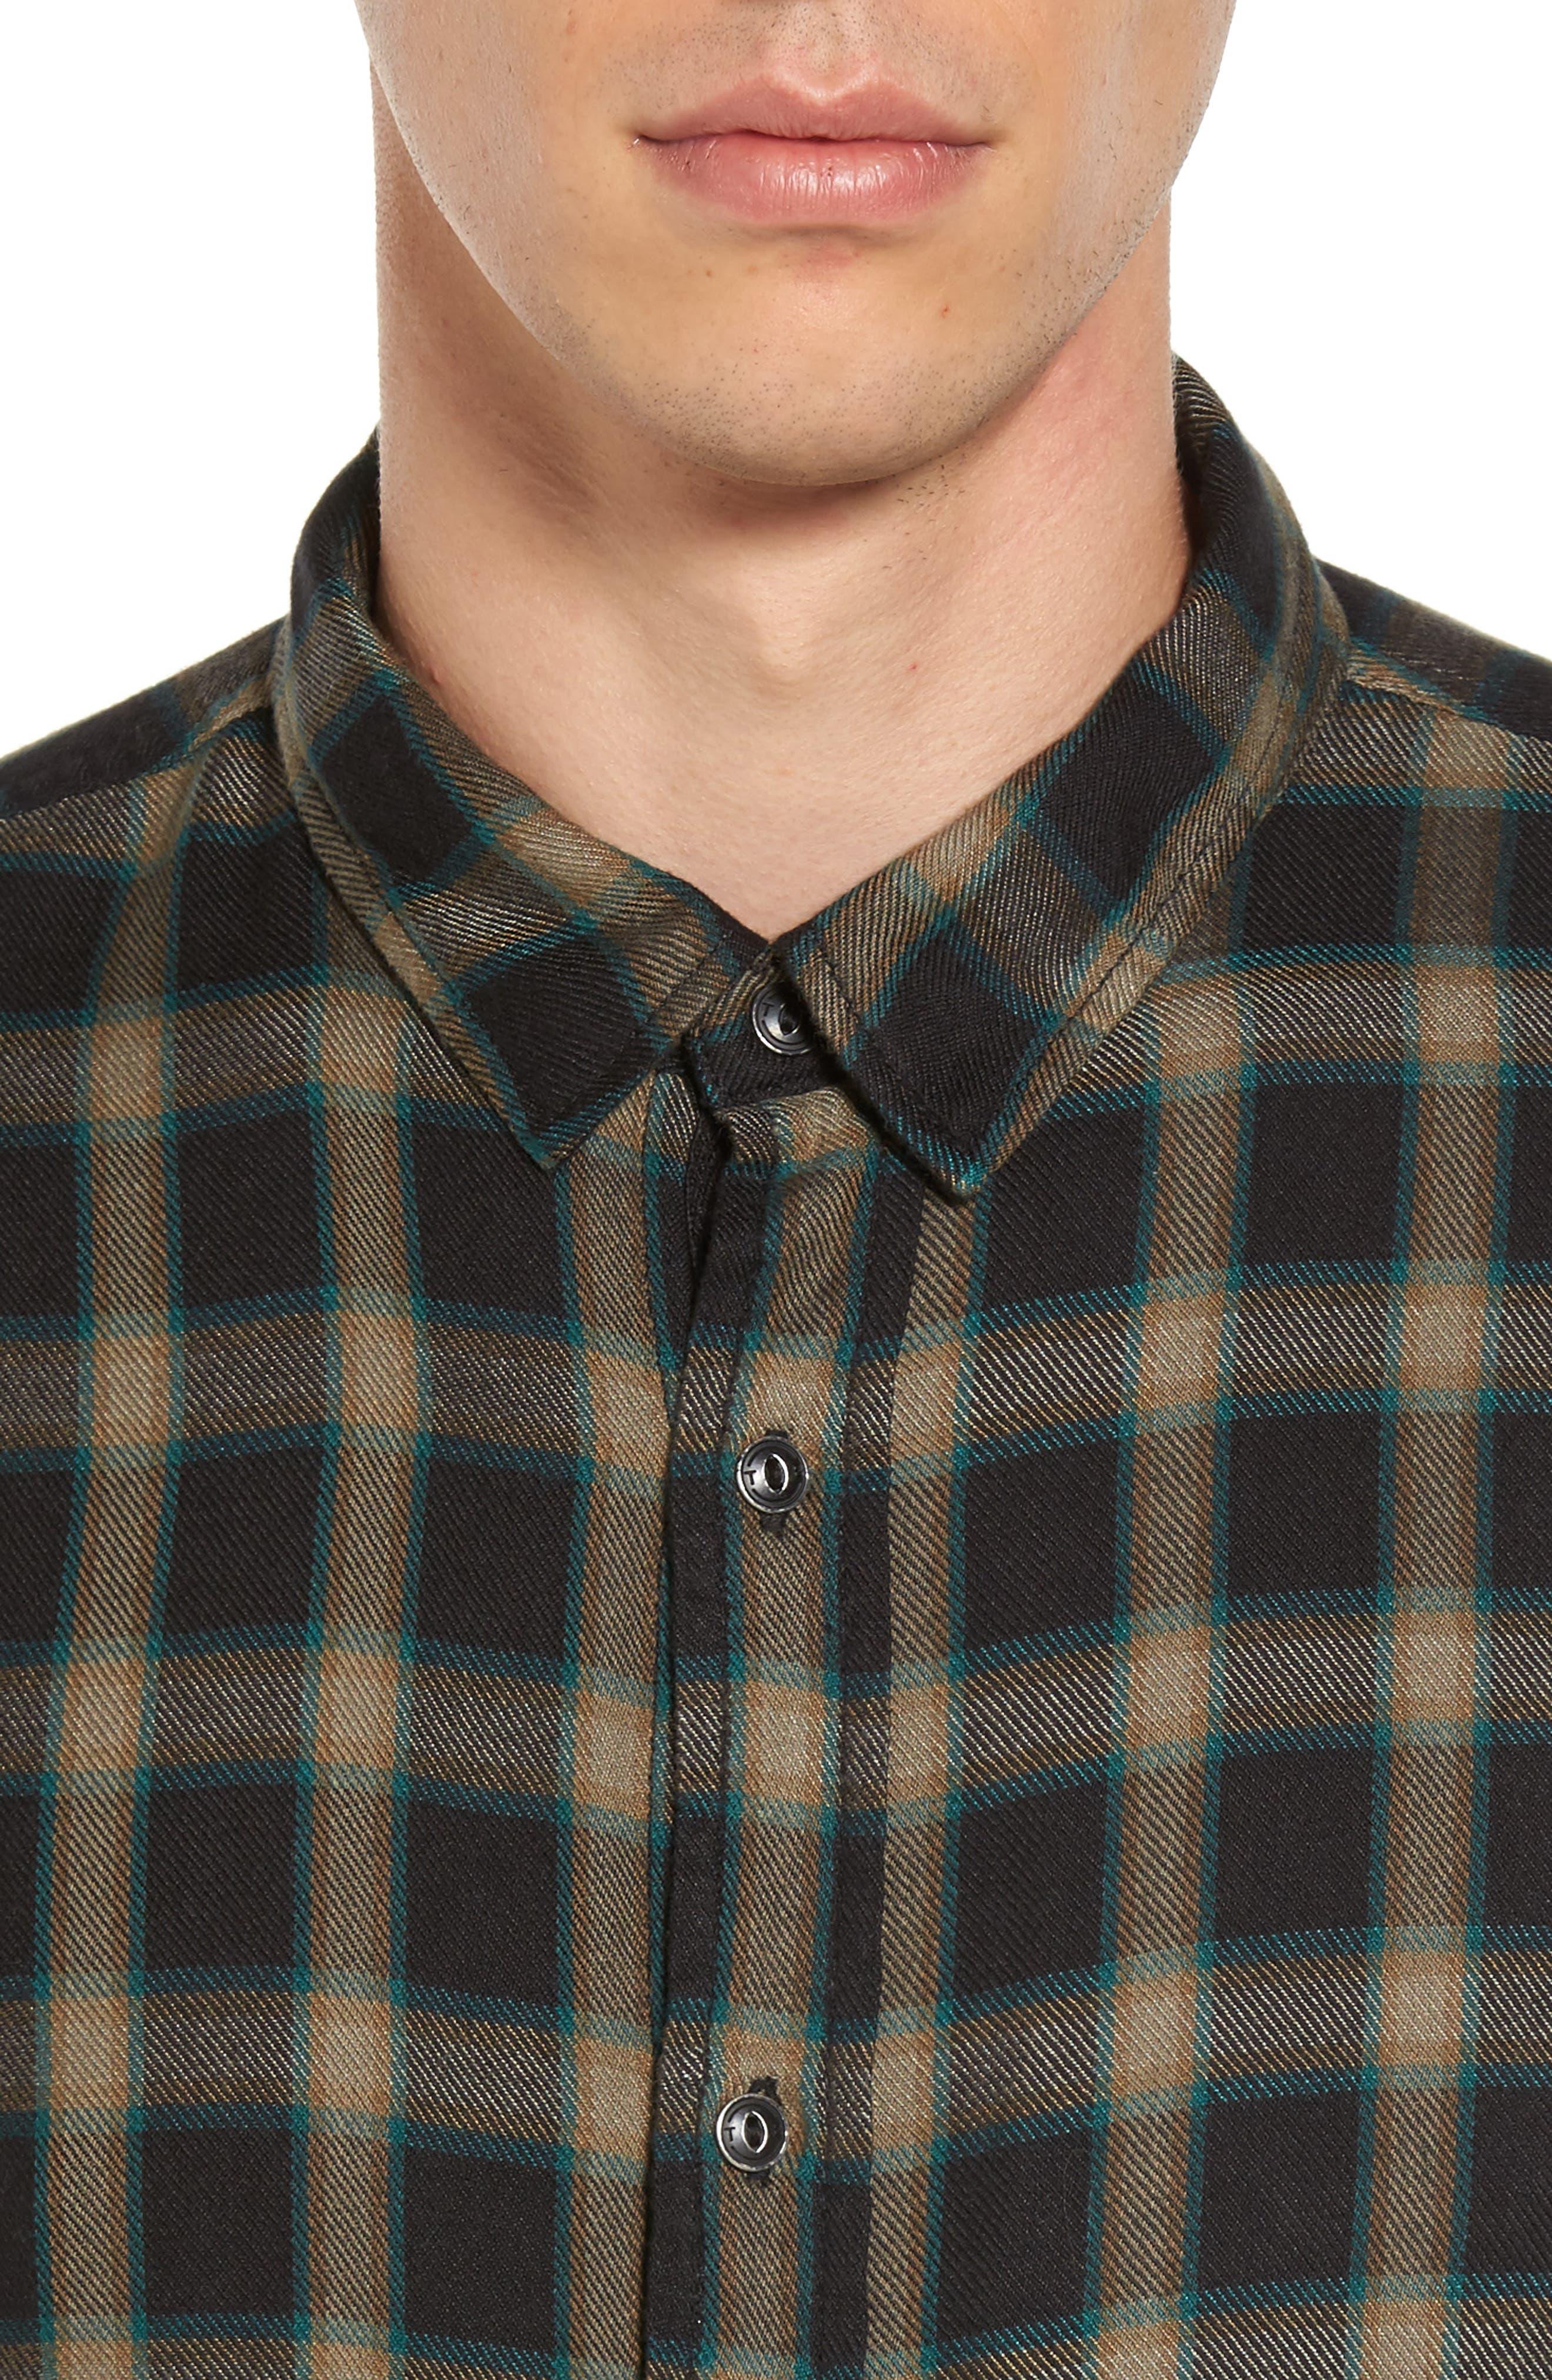 Virgil Plaid Sport Shirt,                             Alternate thumbnail 4, color,                             Black Rock Green Edocha Plaid